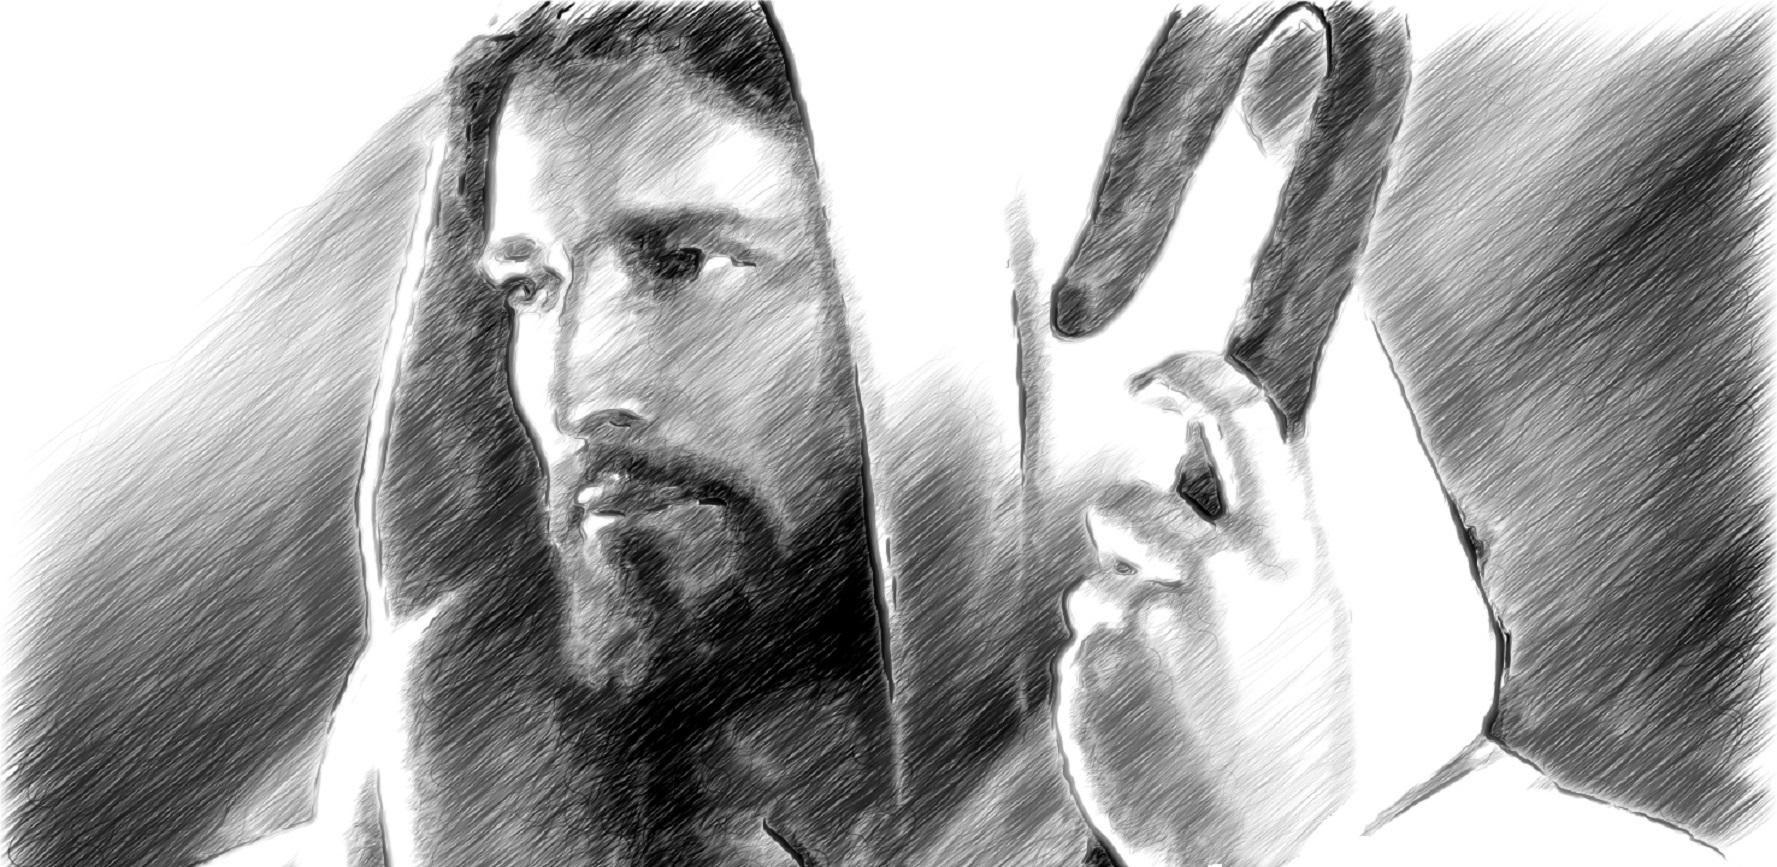 Beautiful savior jesus christ 113333 high quality and